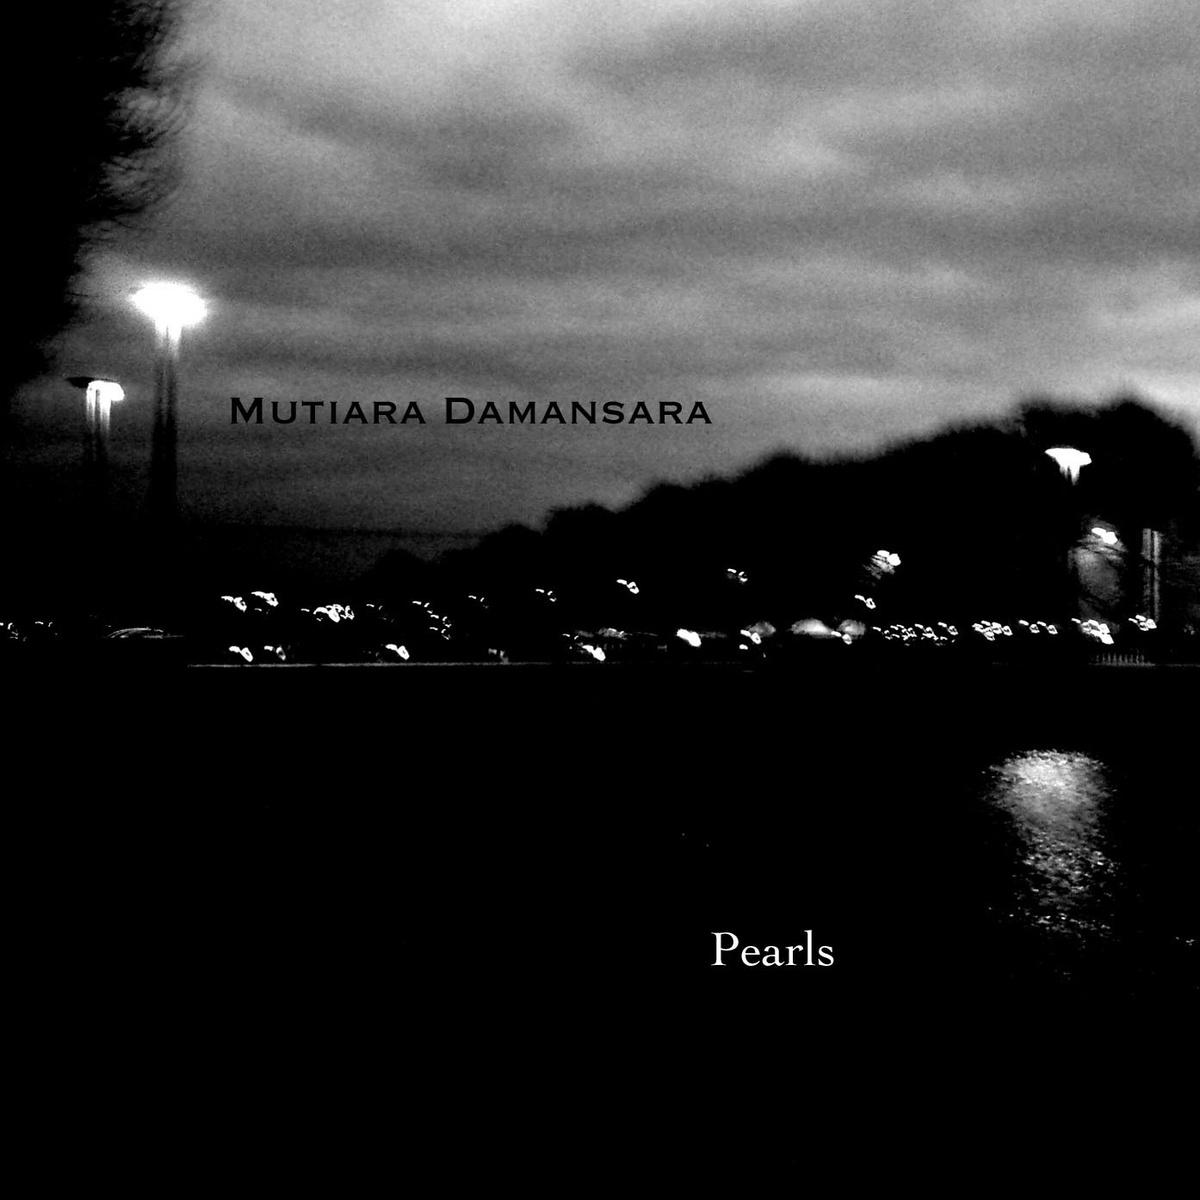 Image from Mutiara Damansara / Bandcamp